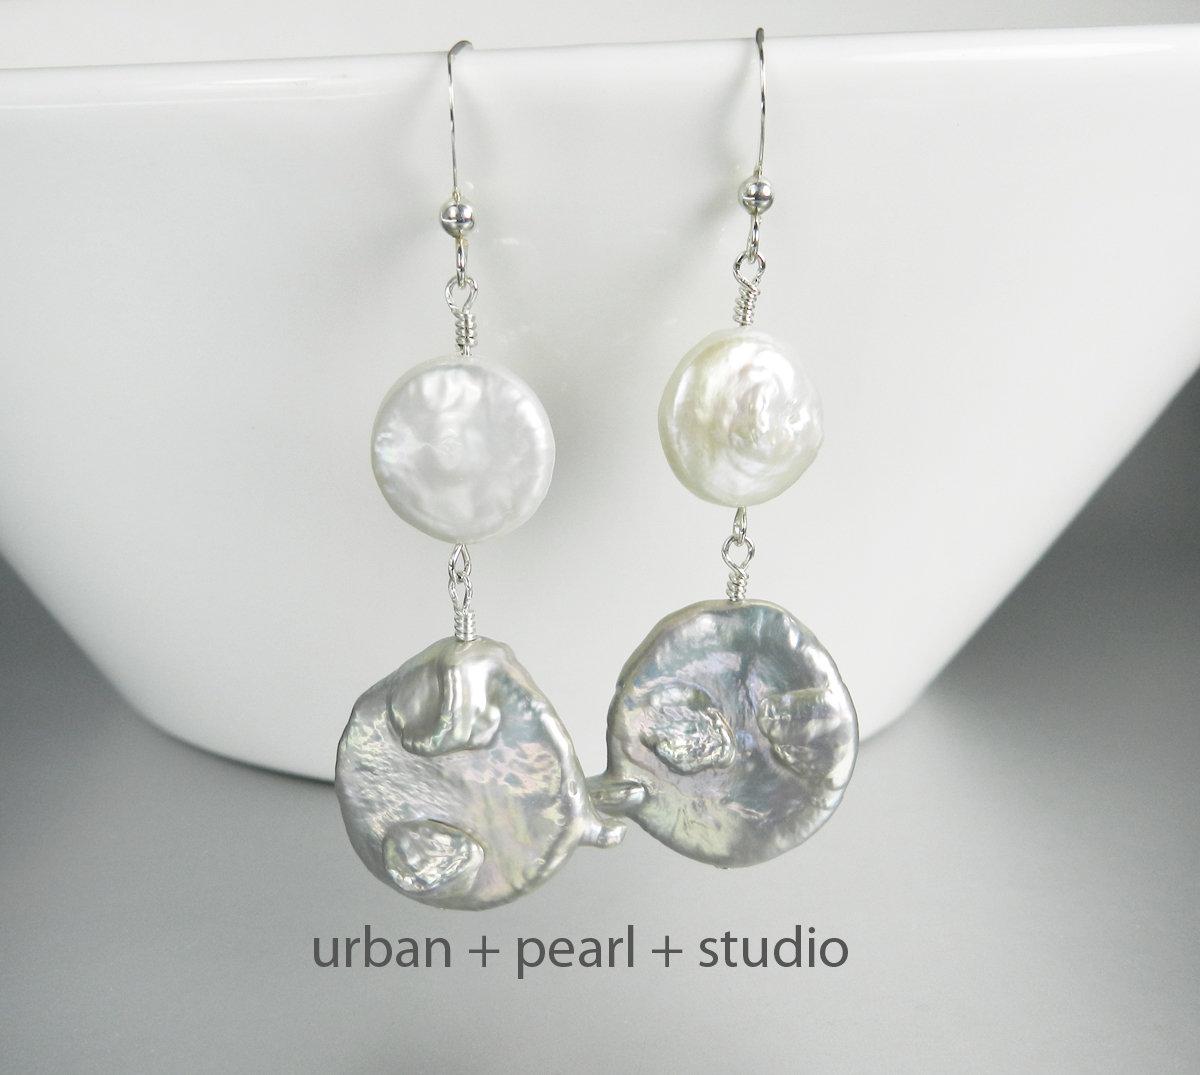 Gray Baroque Pearl Earrings | Grey Dangle Earrings Drops Silver Coin Pearl Earrings CPE33  #handmadejewelry #giftsforher #lovejewelry #pearlnecklace #etsy #handmade